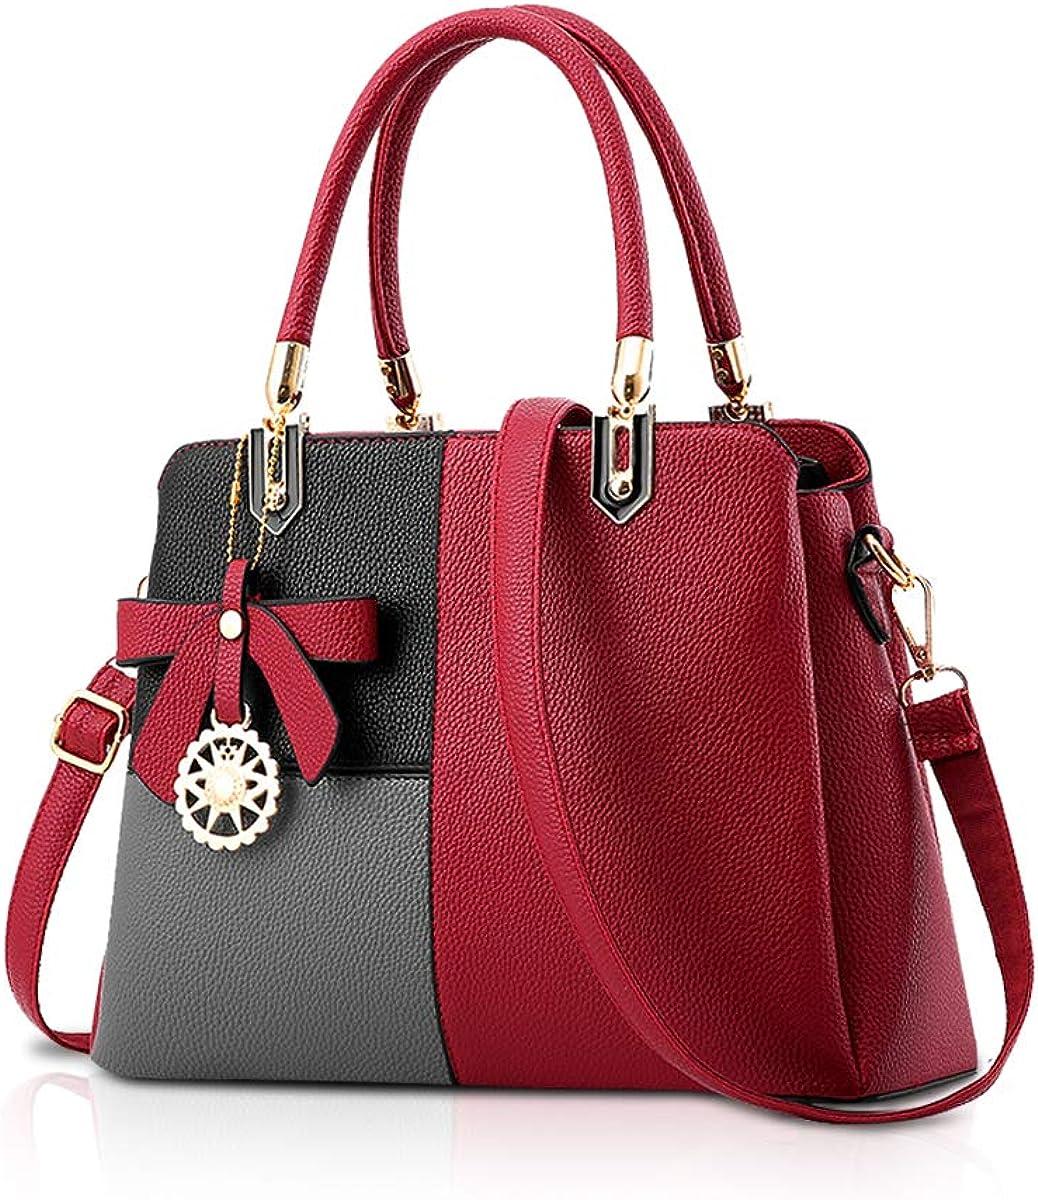 NICOLEDORIS Ladies Handbag Shoulder Bag R Top Handle Free shipping on posting reviews Women Bags Large-scale sale